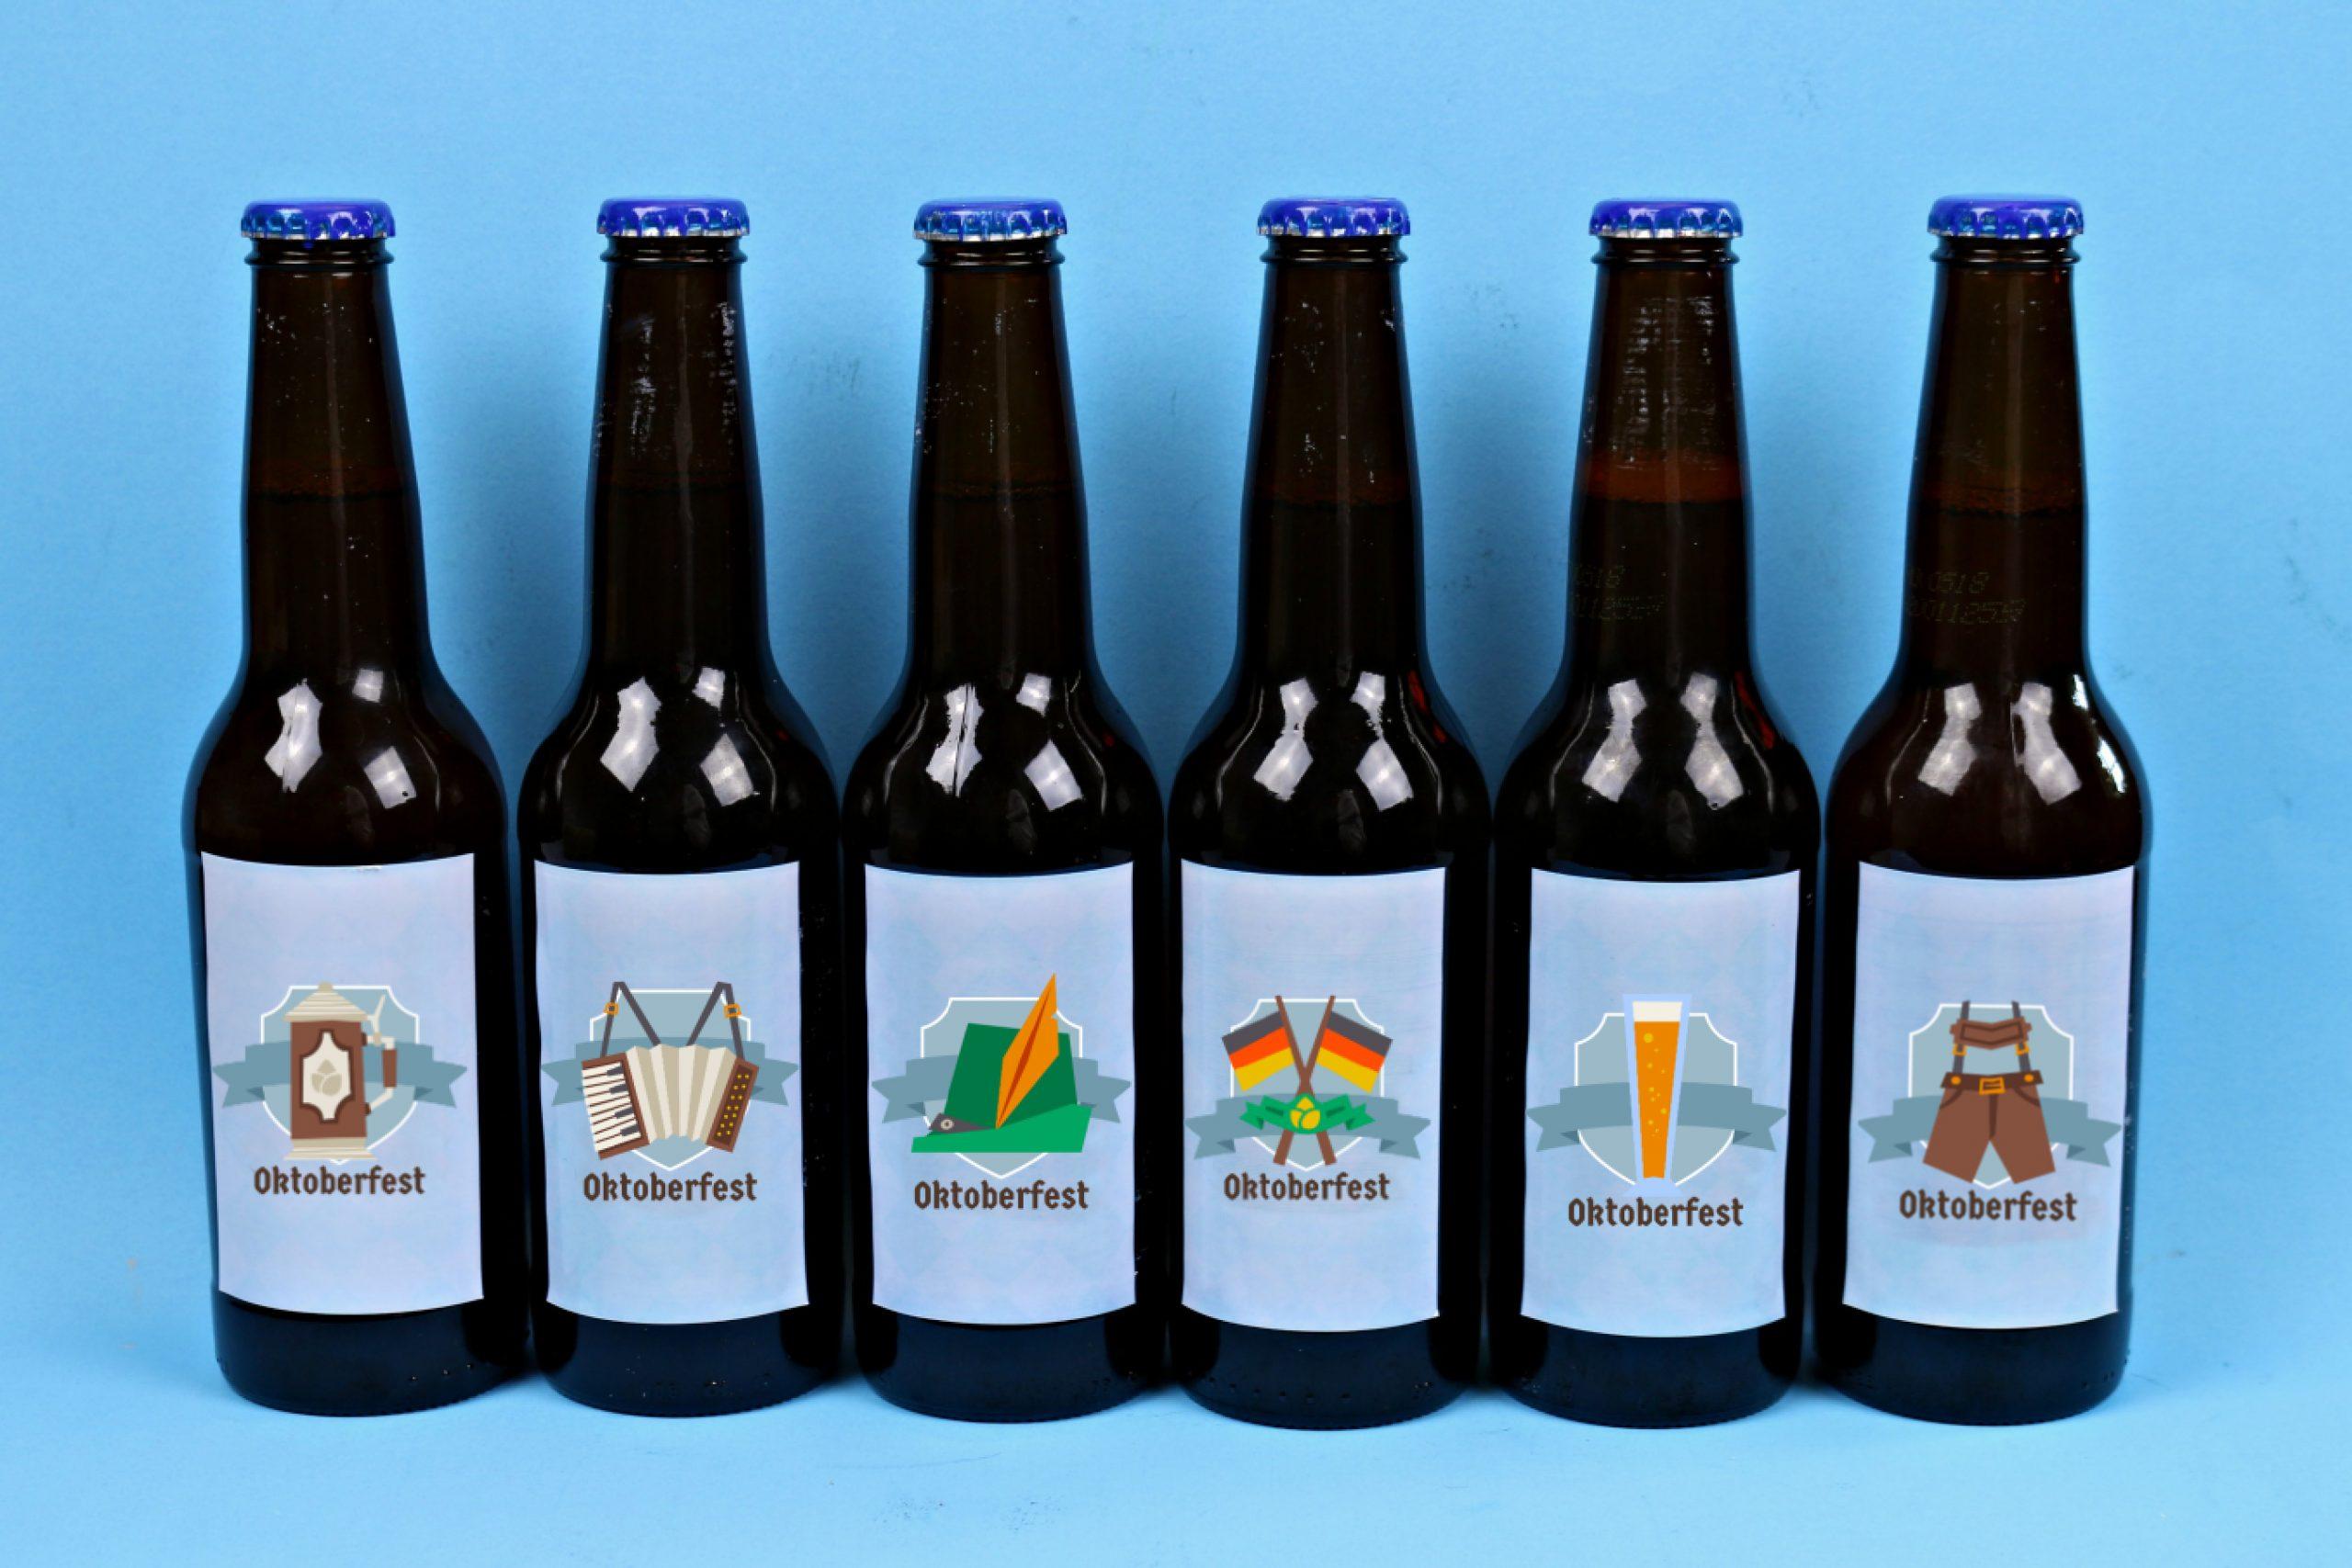 Beer bottles with printable Oktoberfest sticker labels on a blue background